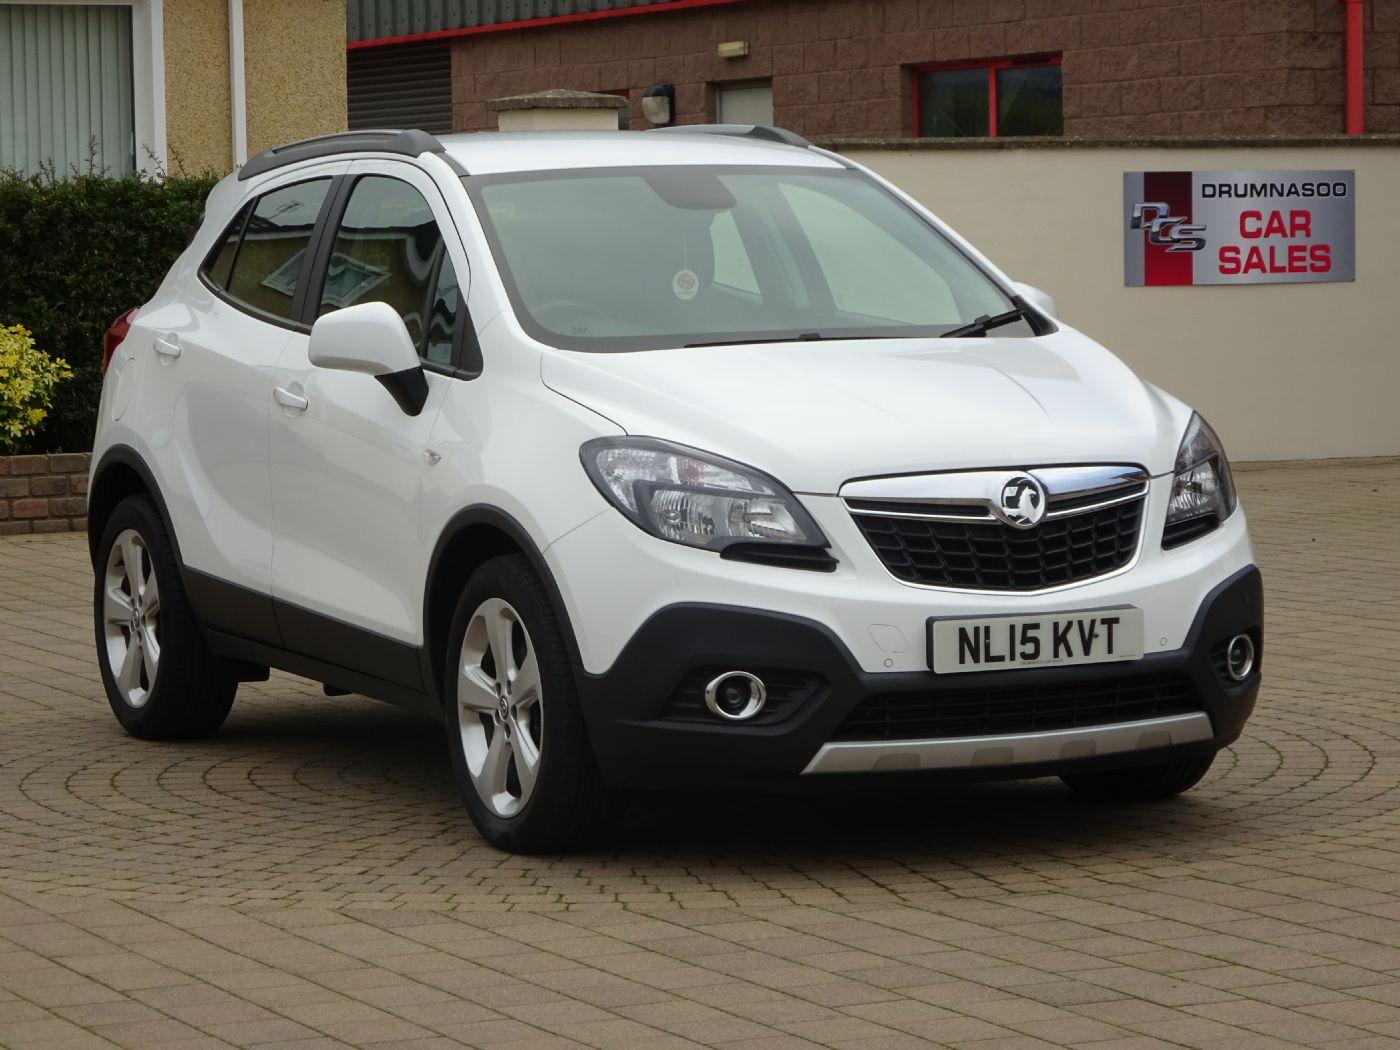 Vauxhall Mokka 1.7 Cdti Exclusiv, Front & rear parking sensors